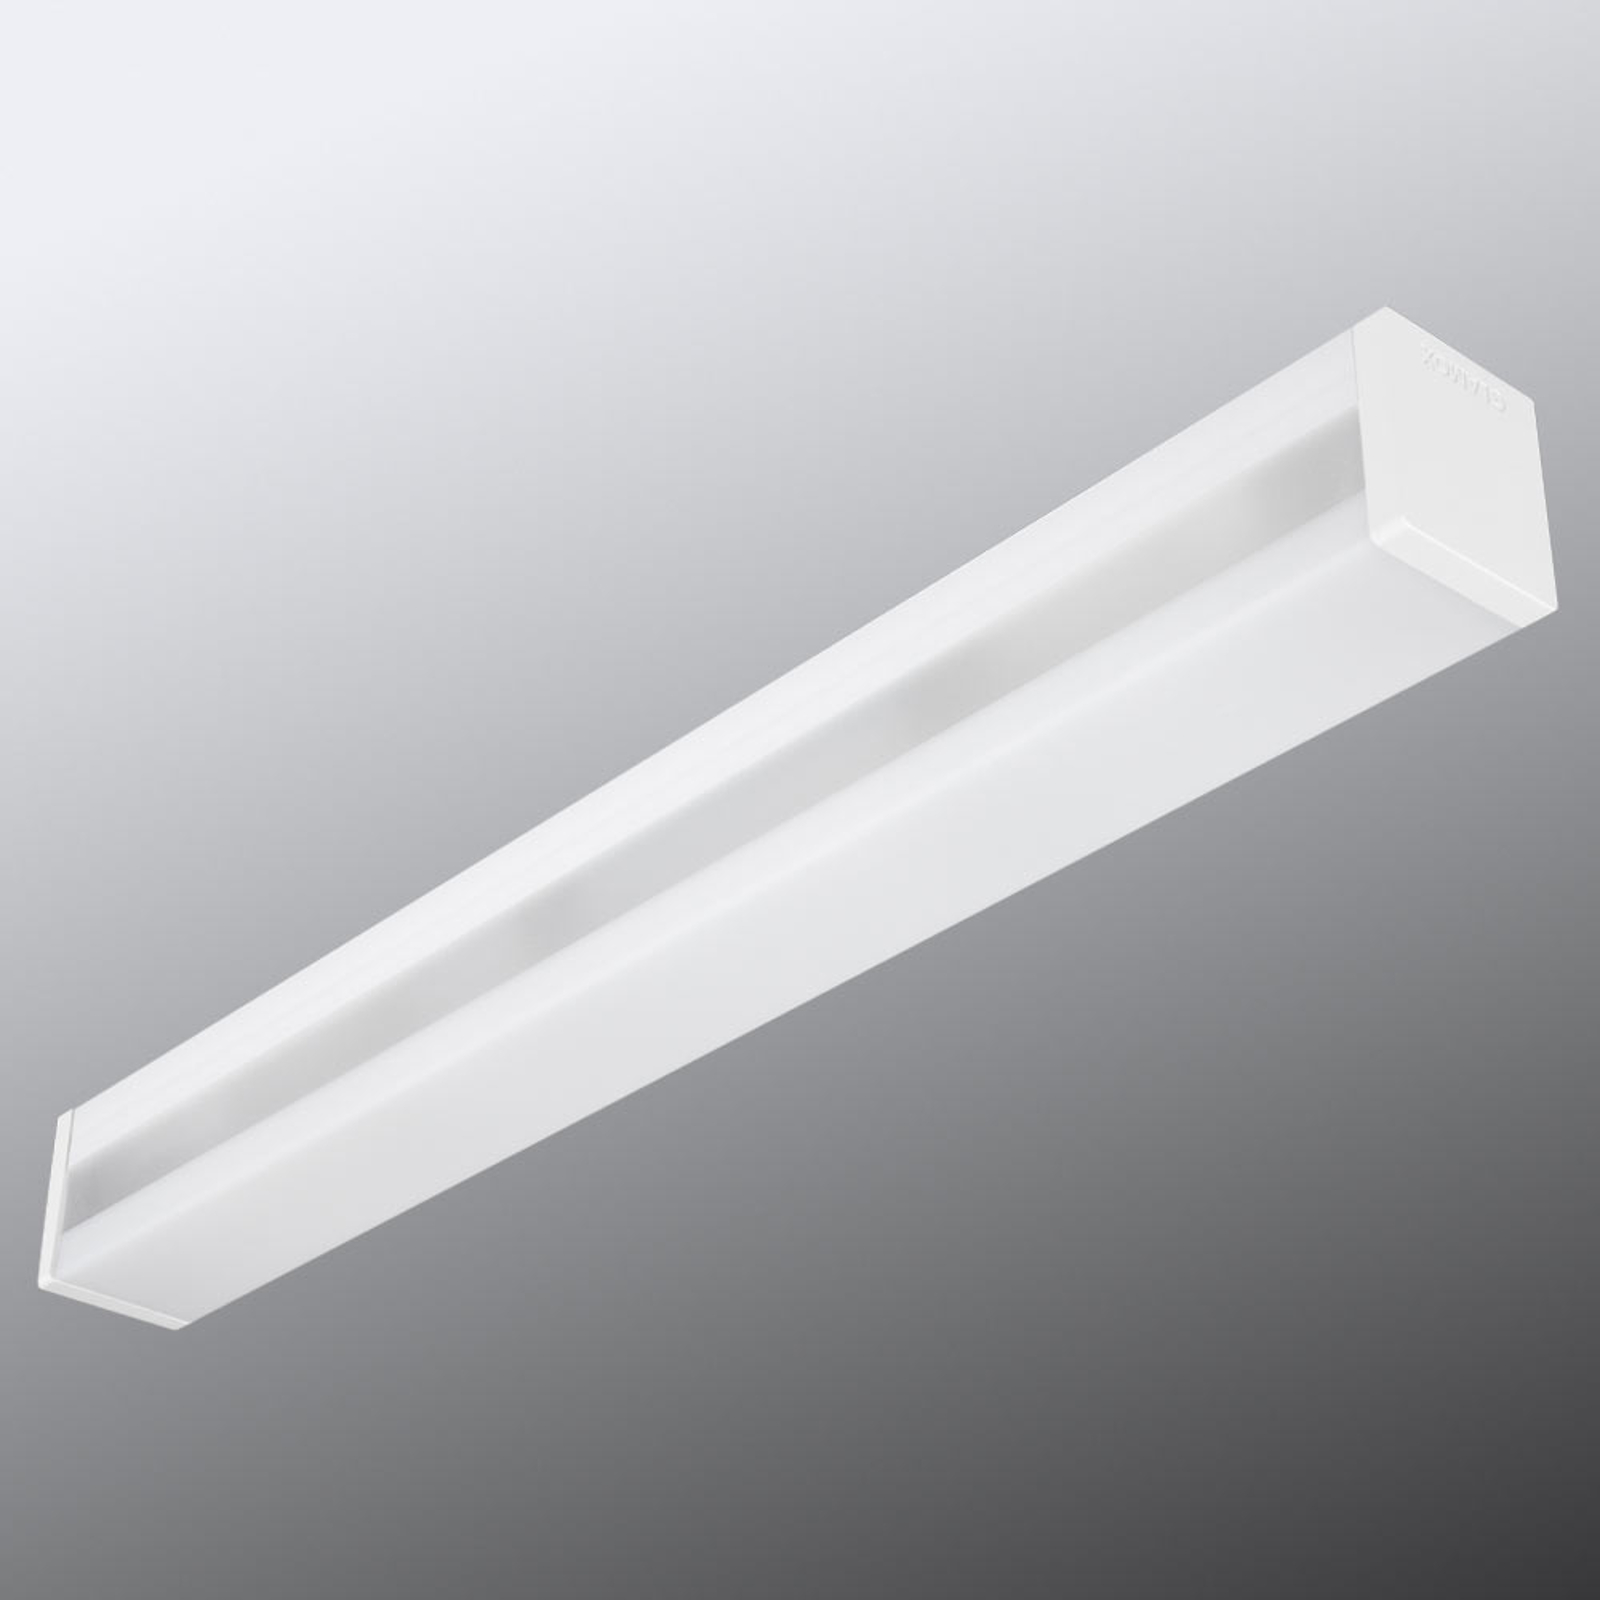 LED-peilivalaisin A40-W600 LED 1400HF 830 60 cm